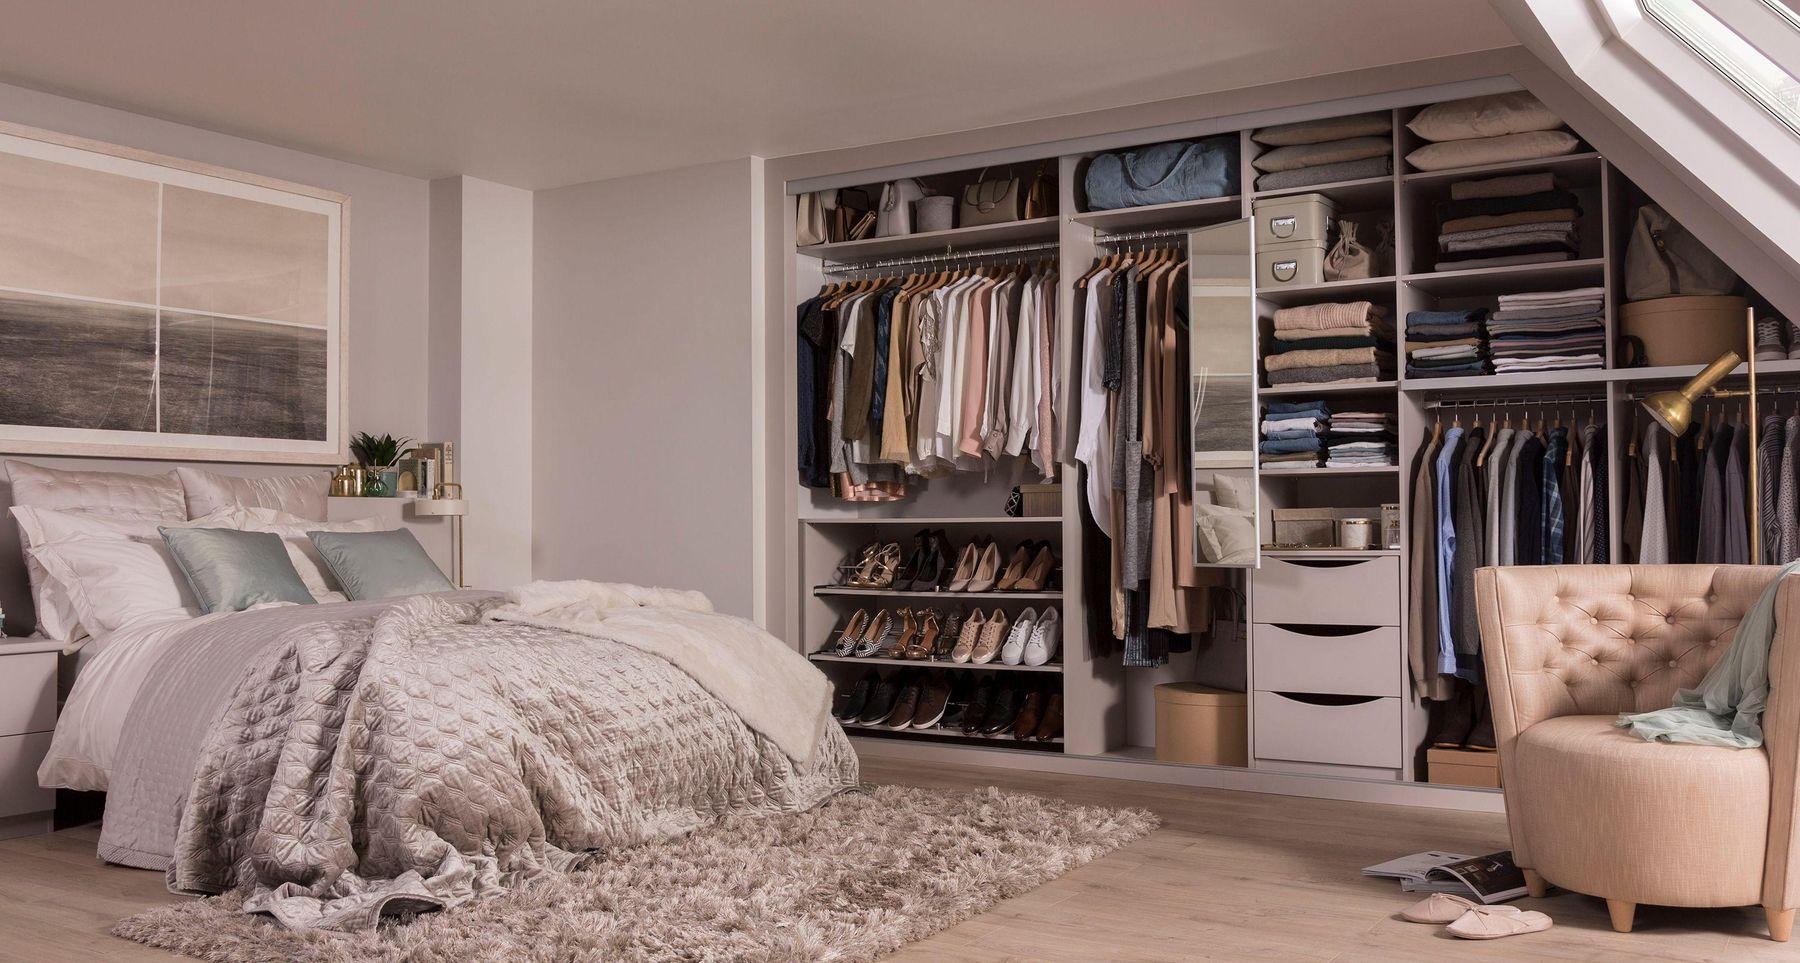 Bedroom Interiors Design Ideas, Fitted Bedroom Wardrobes